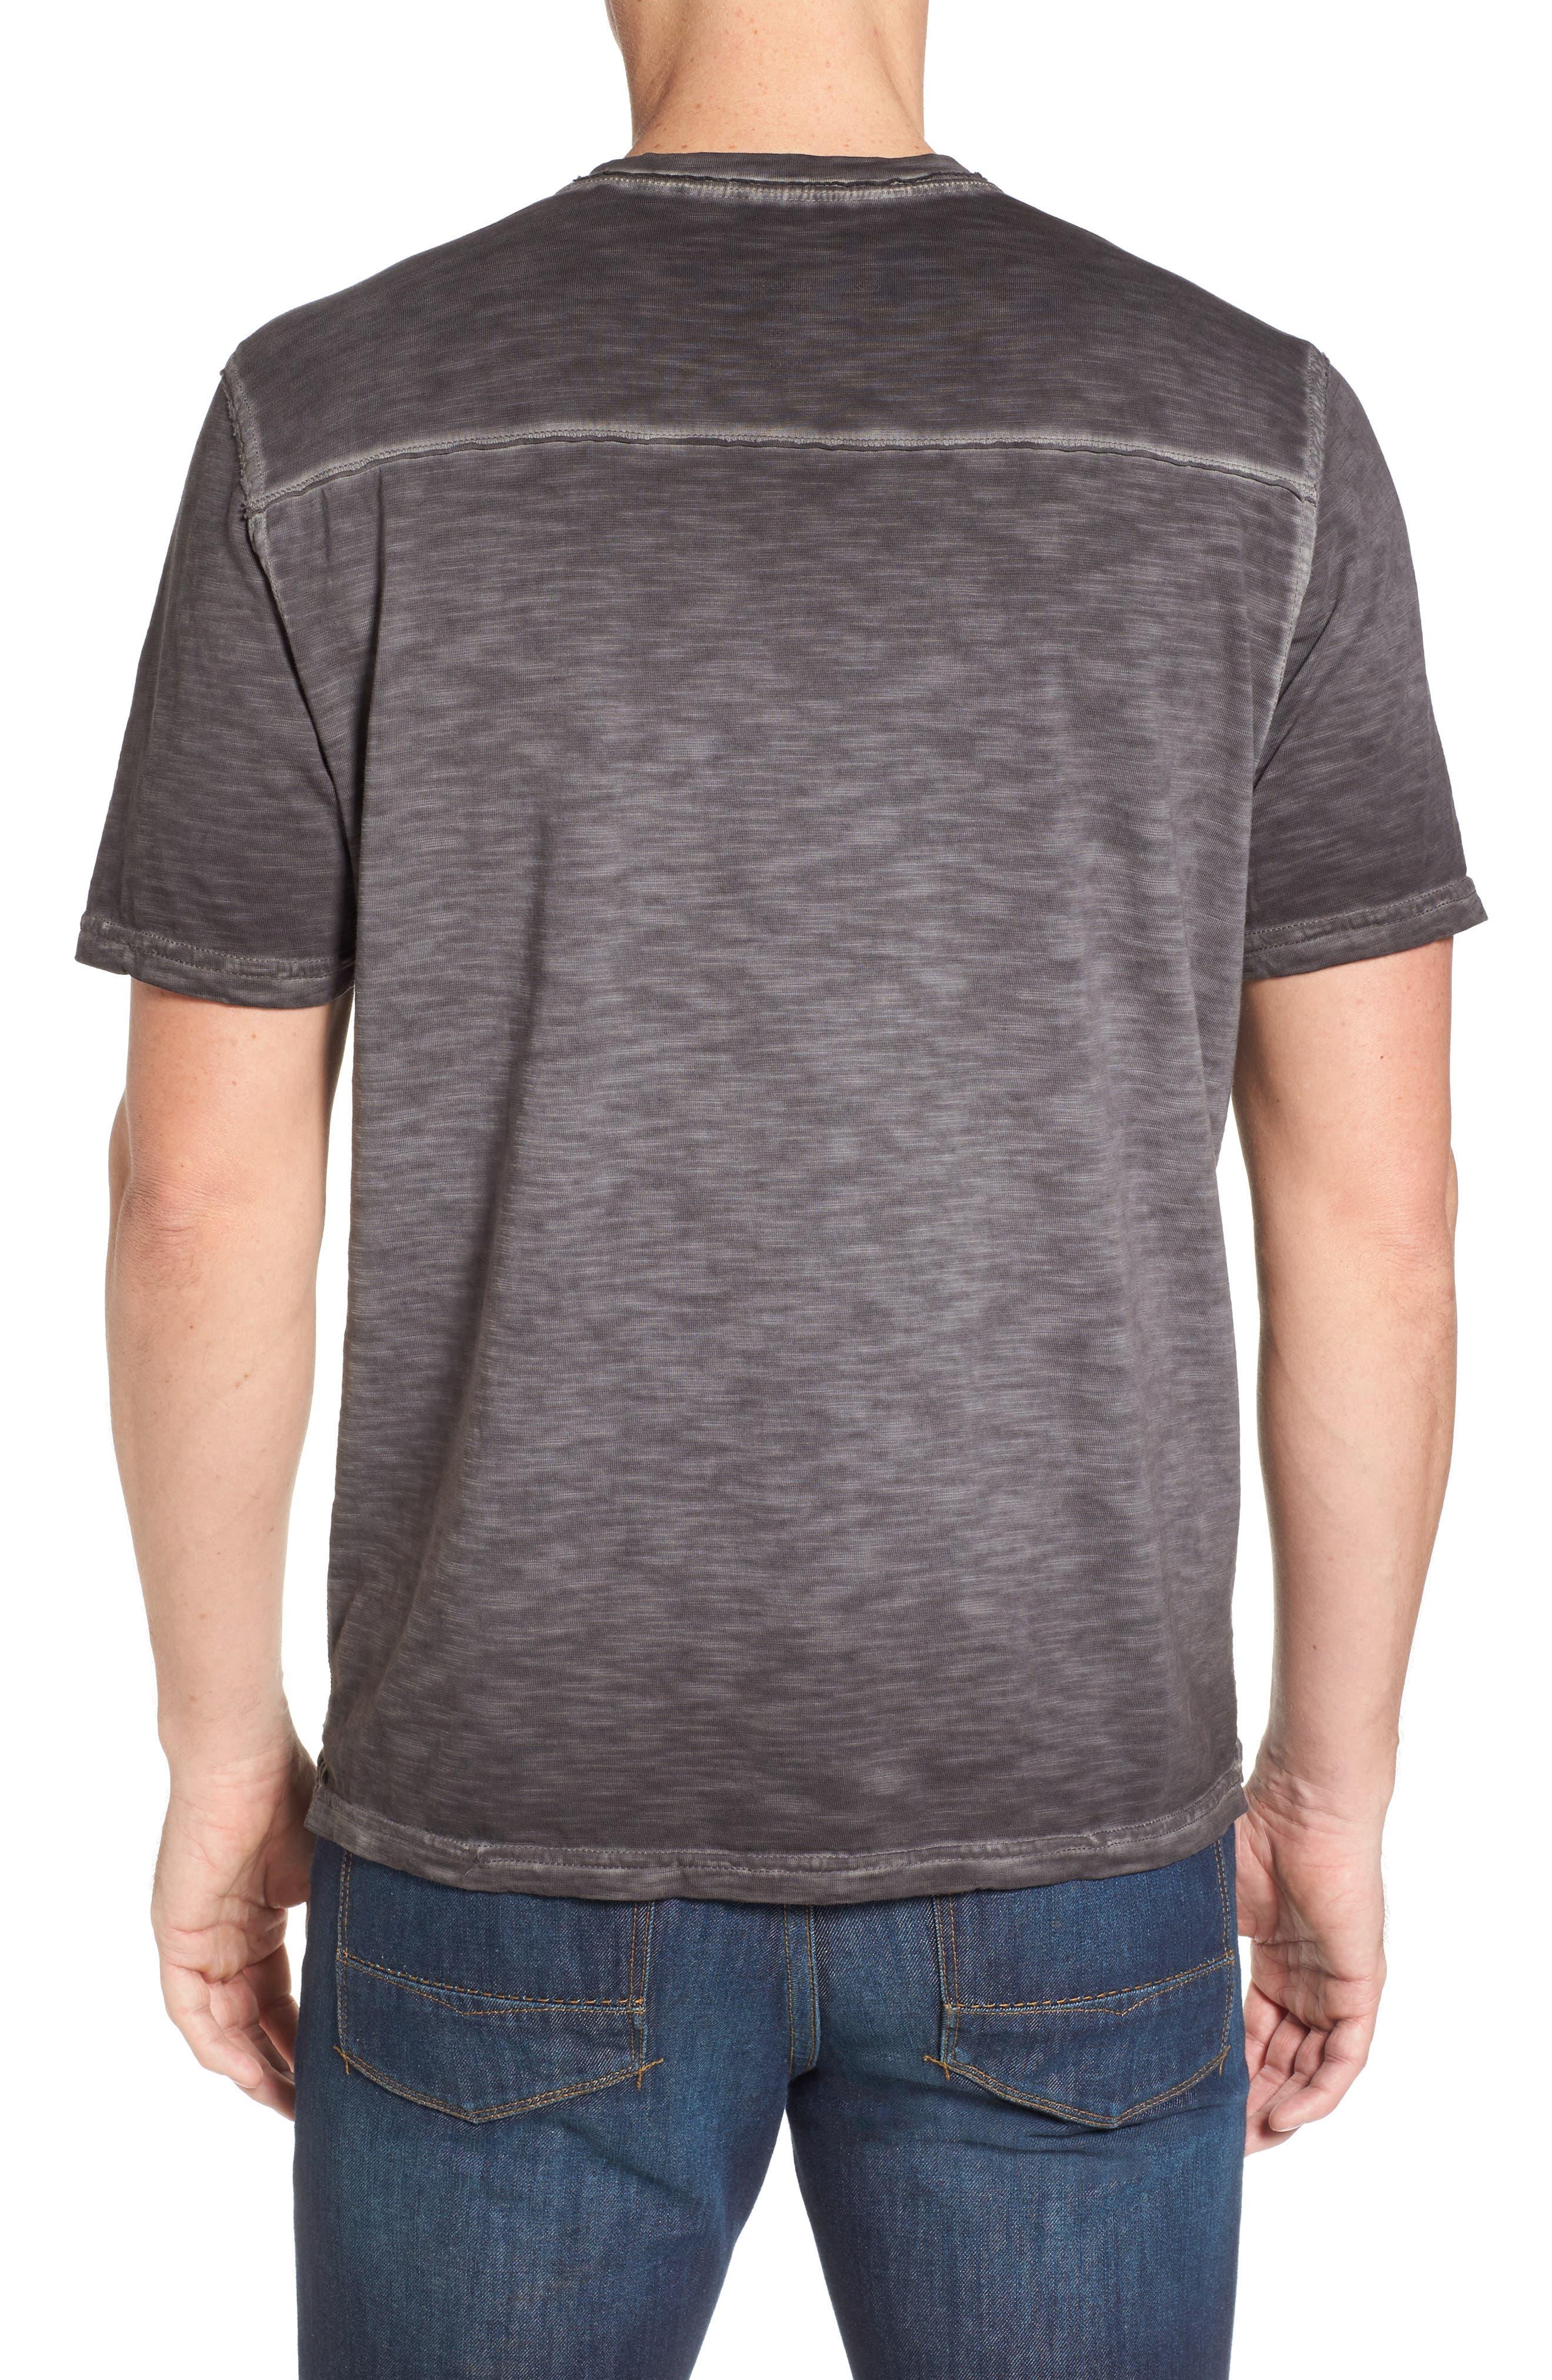 Suncoast Shores V-Neck T-Shirt,                             Alternate thumbnail 2, color,                             001